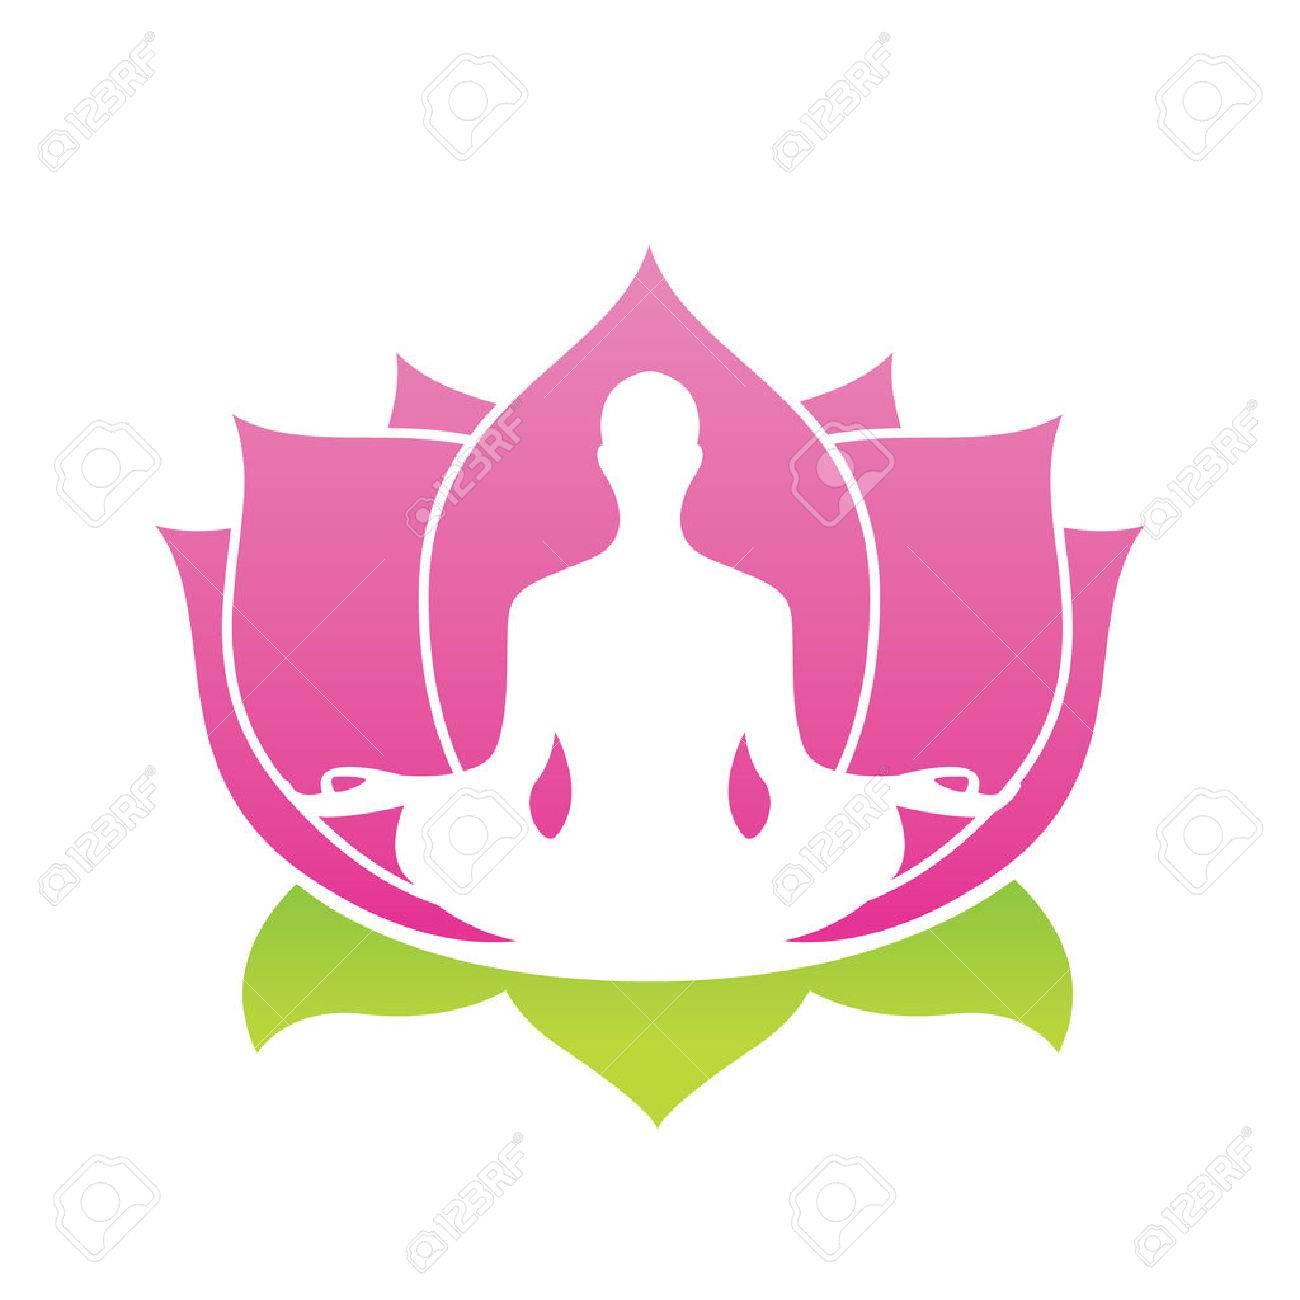 Lotus flower abstract vector icon yoga asana illustration royalty lotus flower abstract vector icon yoga asana illustration stock vector 37667437 mightylinksfo